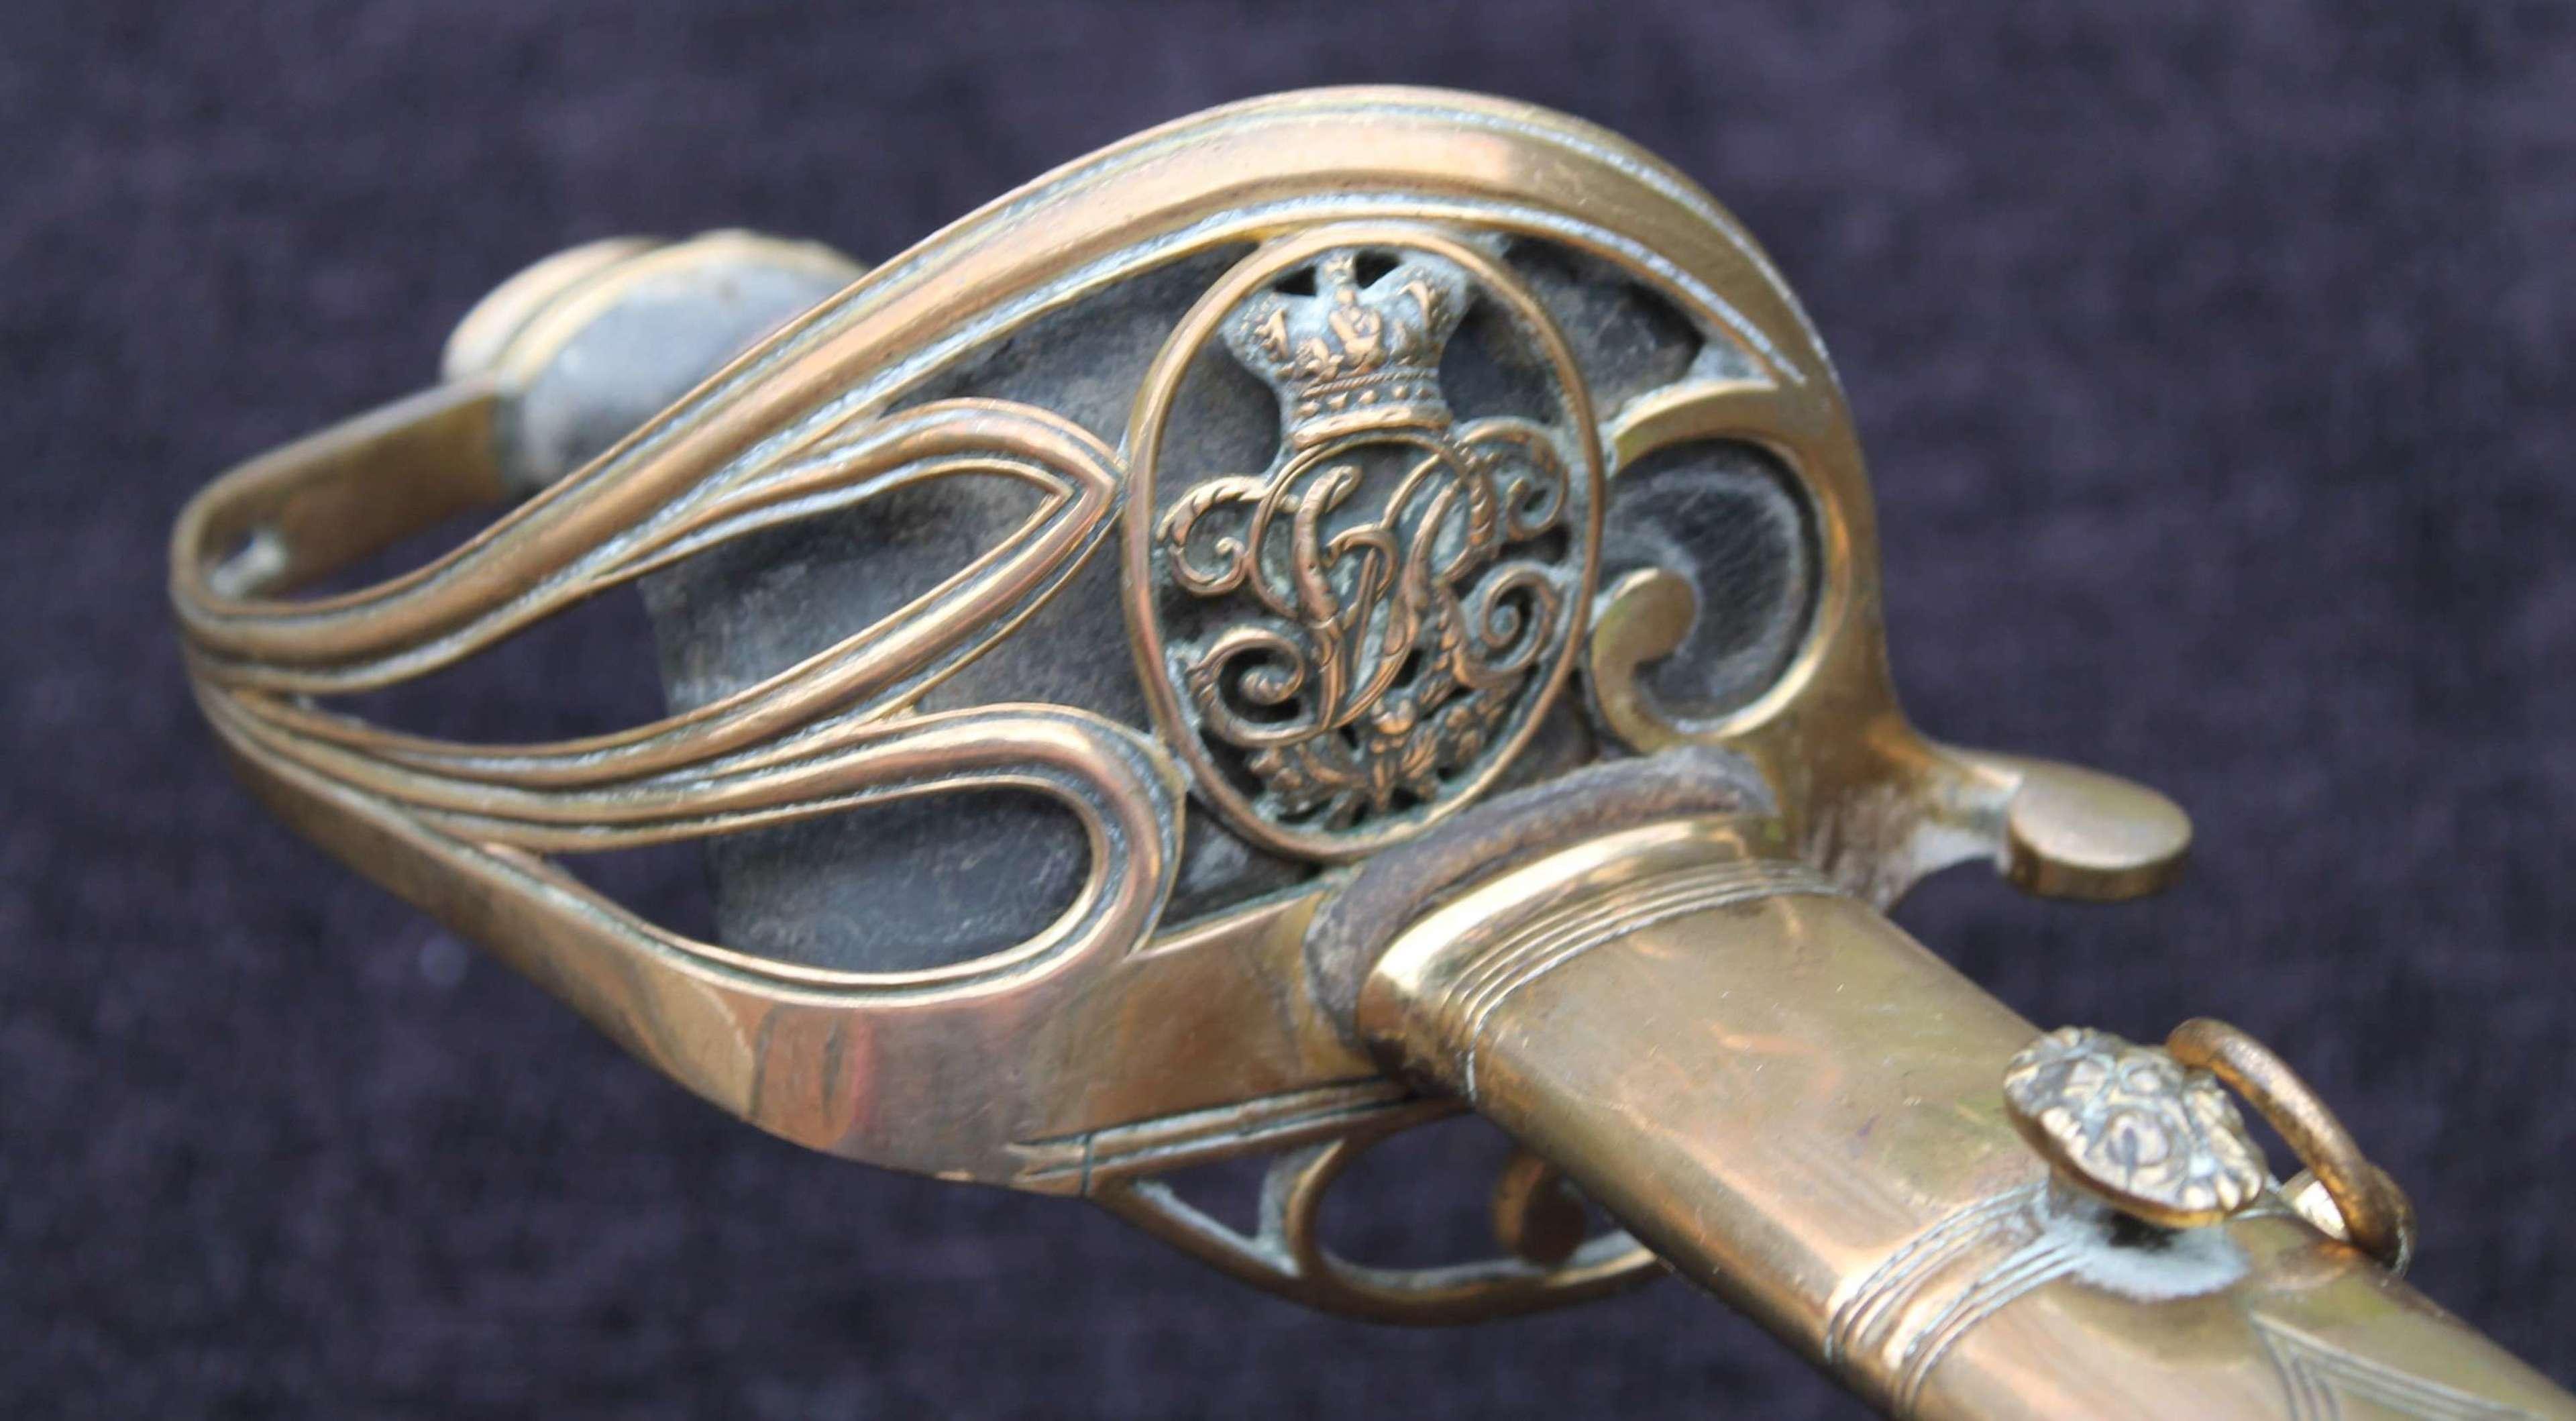 1822 Pattern Infantry Officers Sword